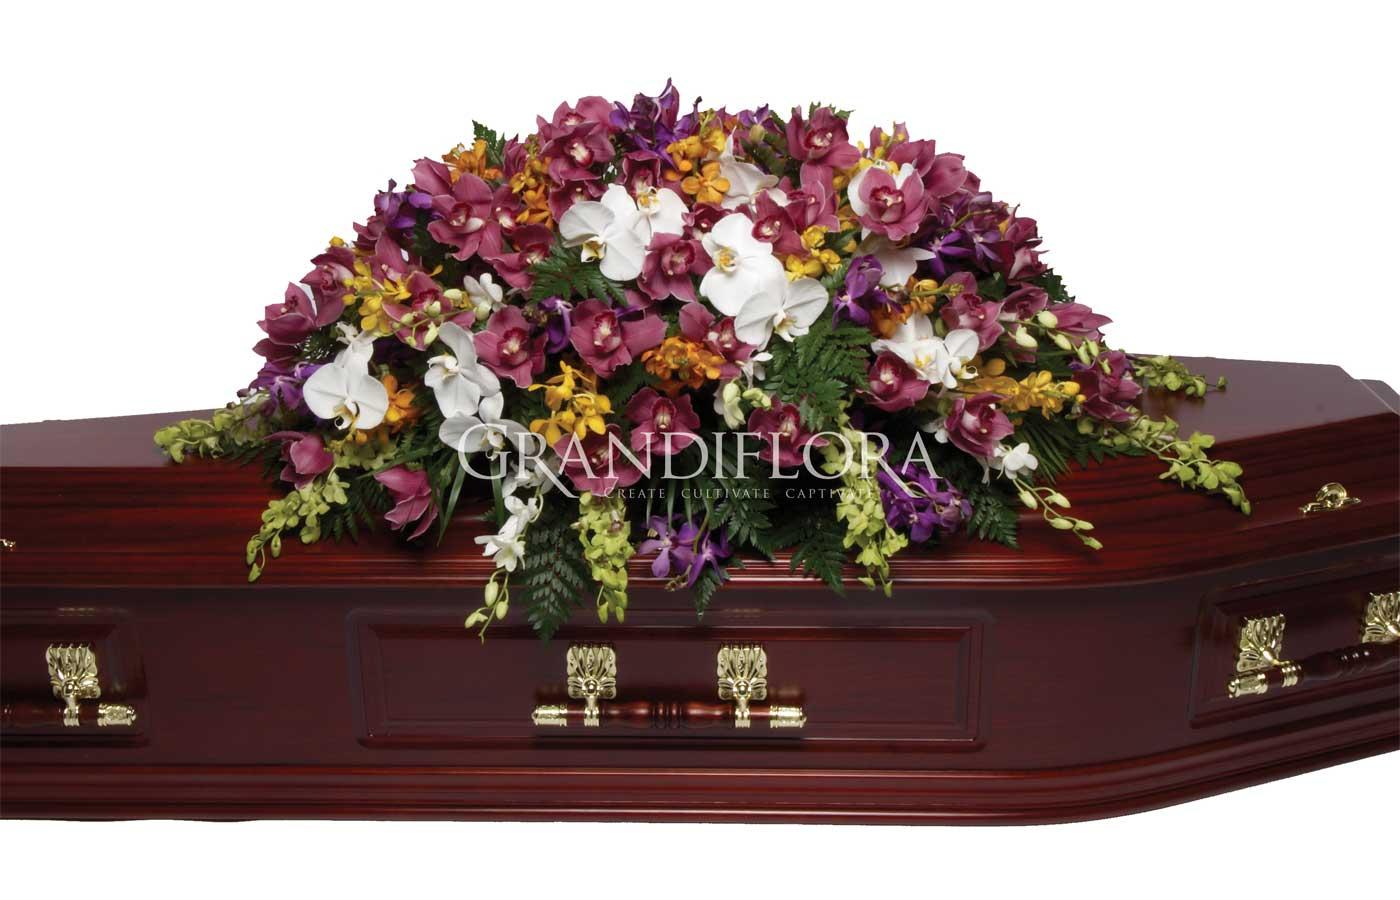 Arranging a funeral botanical funerals deluxeorchid izmirmasajfo